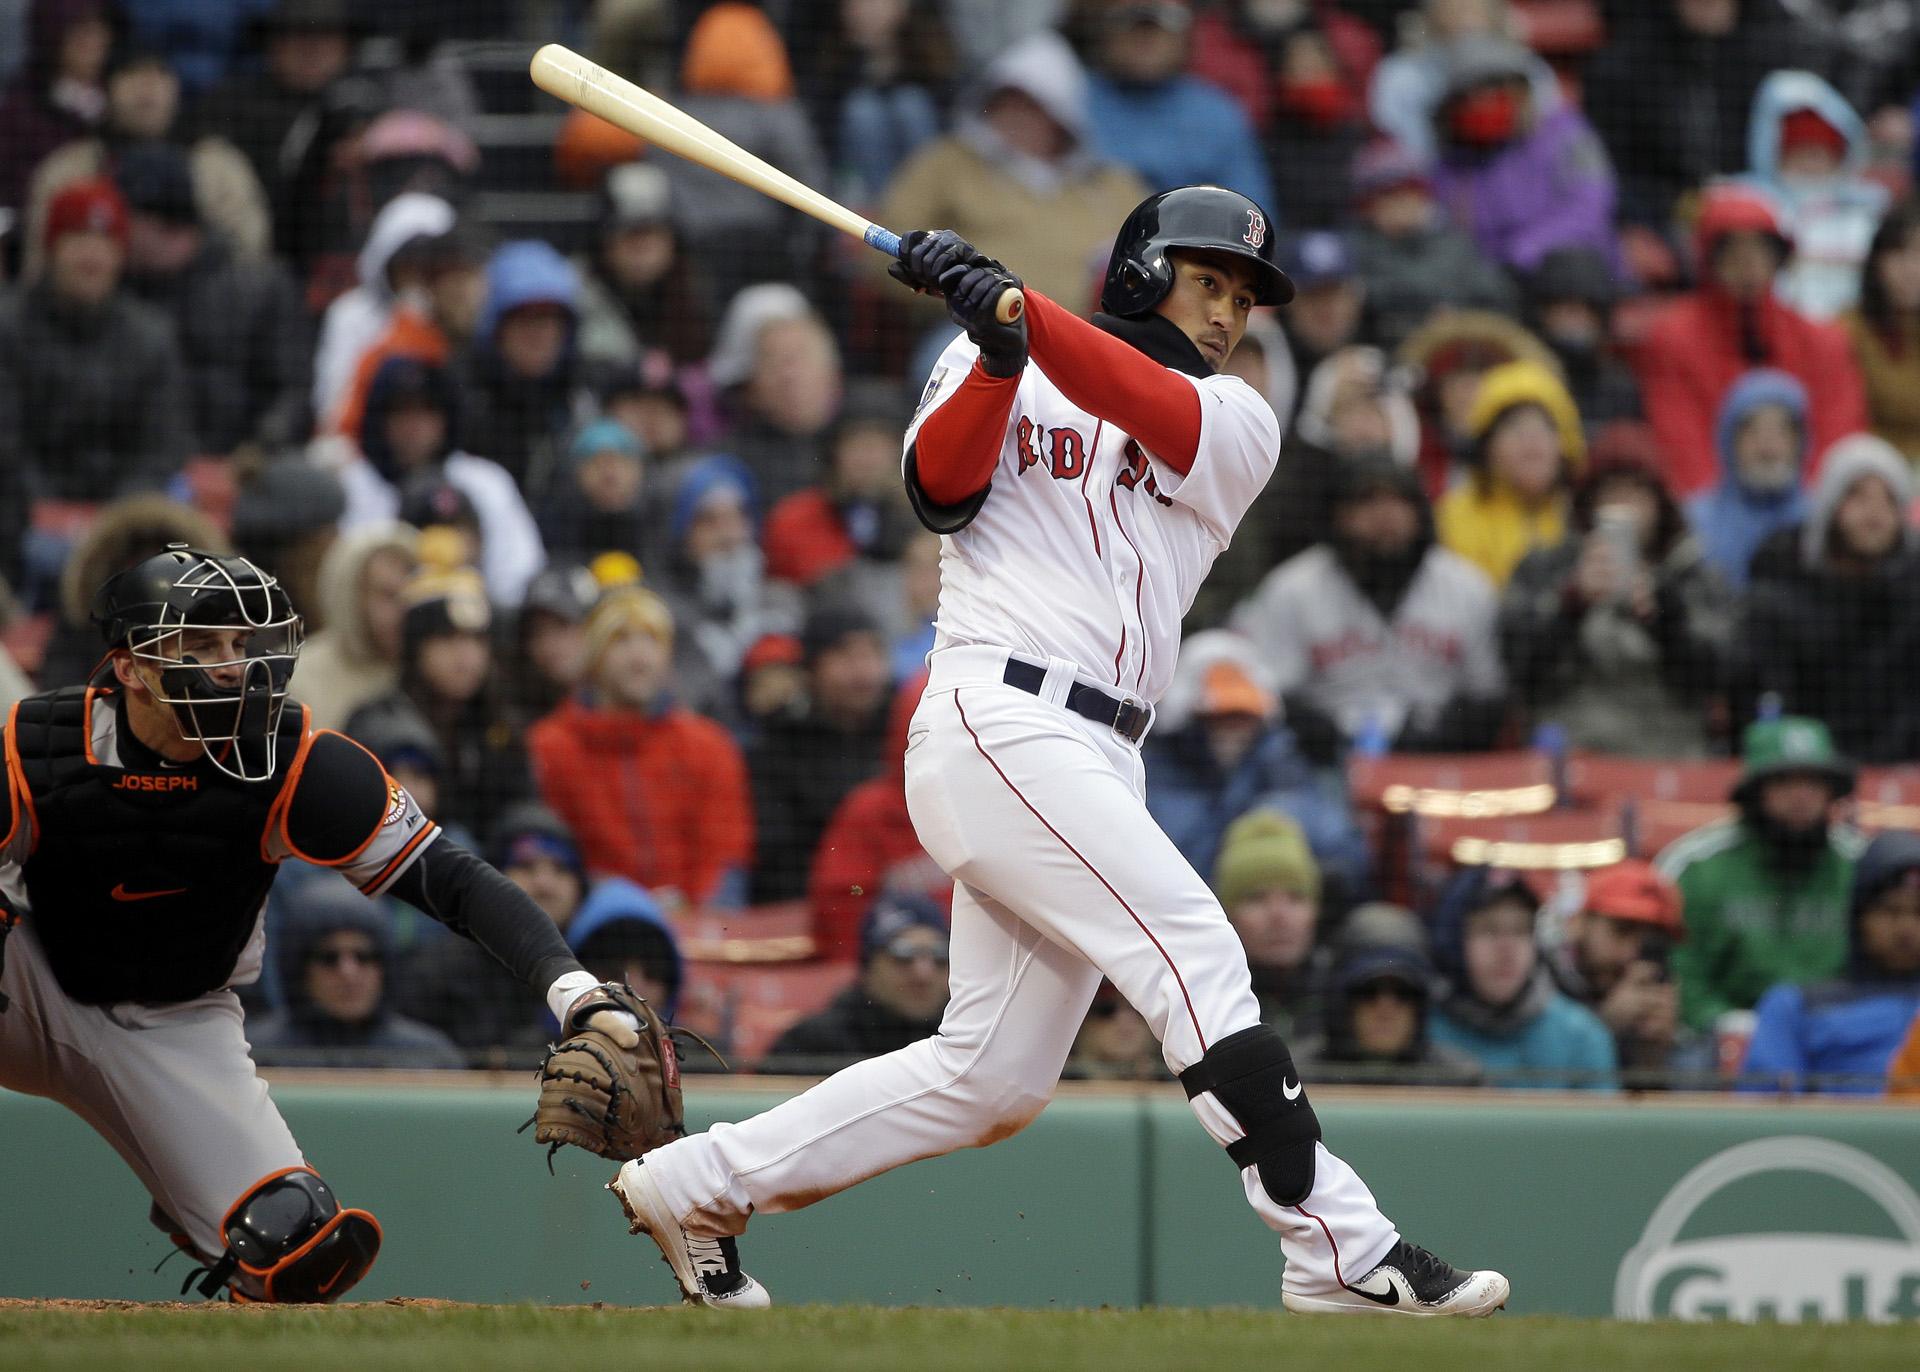 Orioles Red Sox Baseball_1523824705348